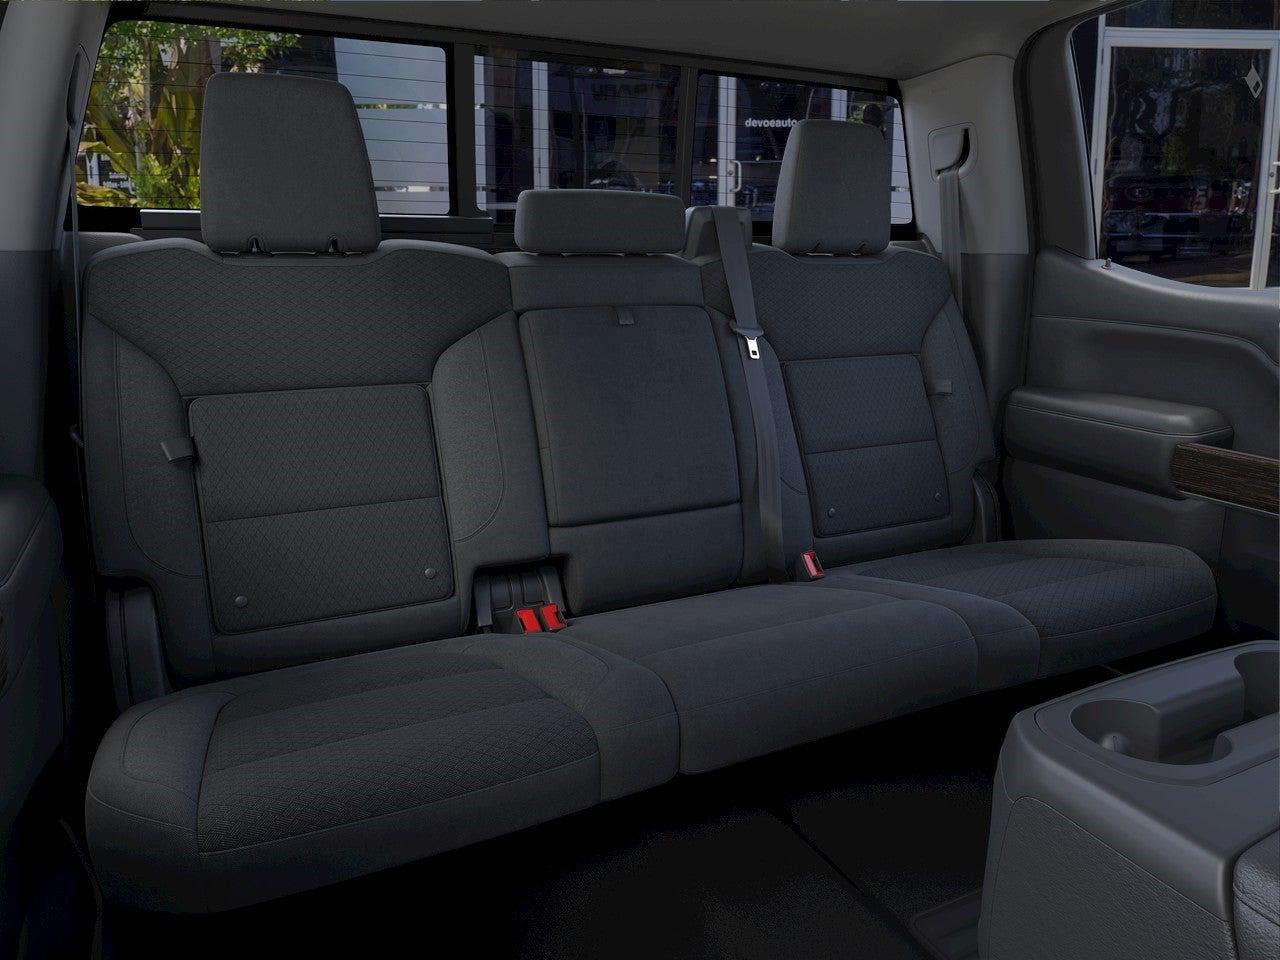 2021 GMC Sierra 1500 Crew Cab 4x2, Pickup #T21388 - photo 34